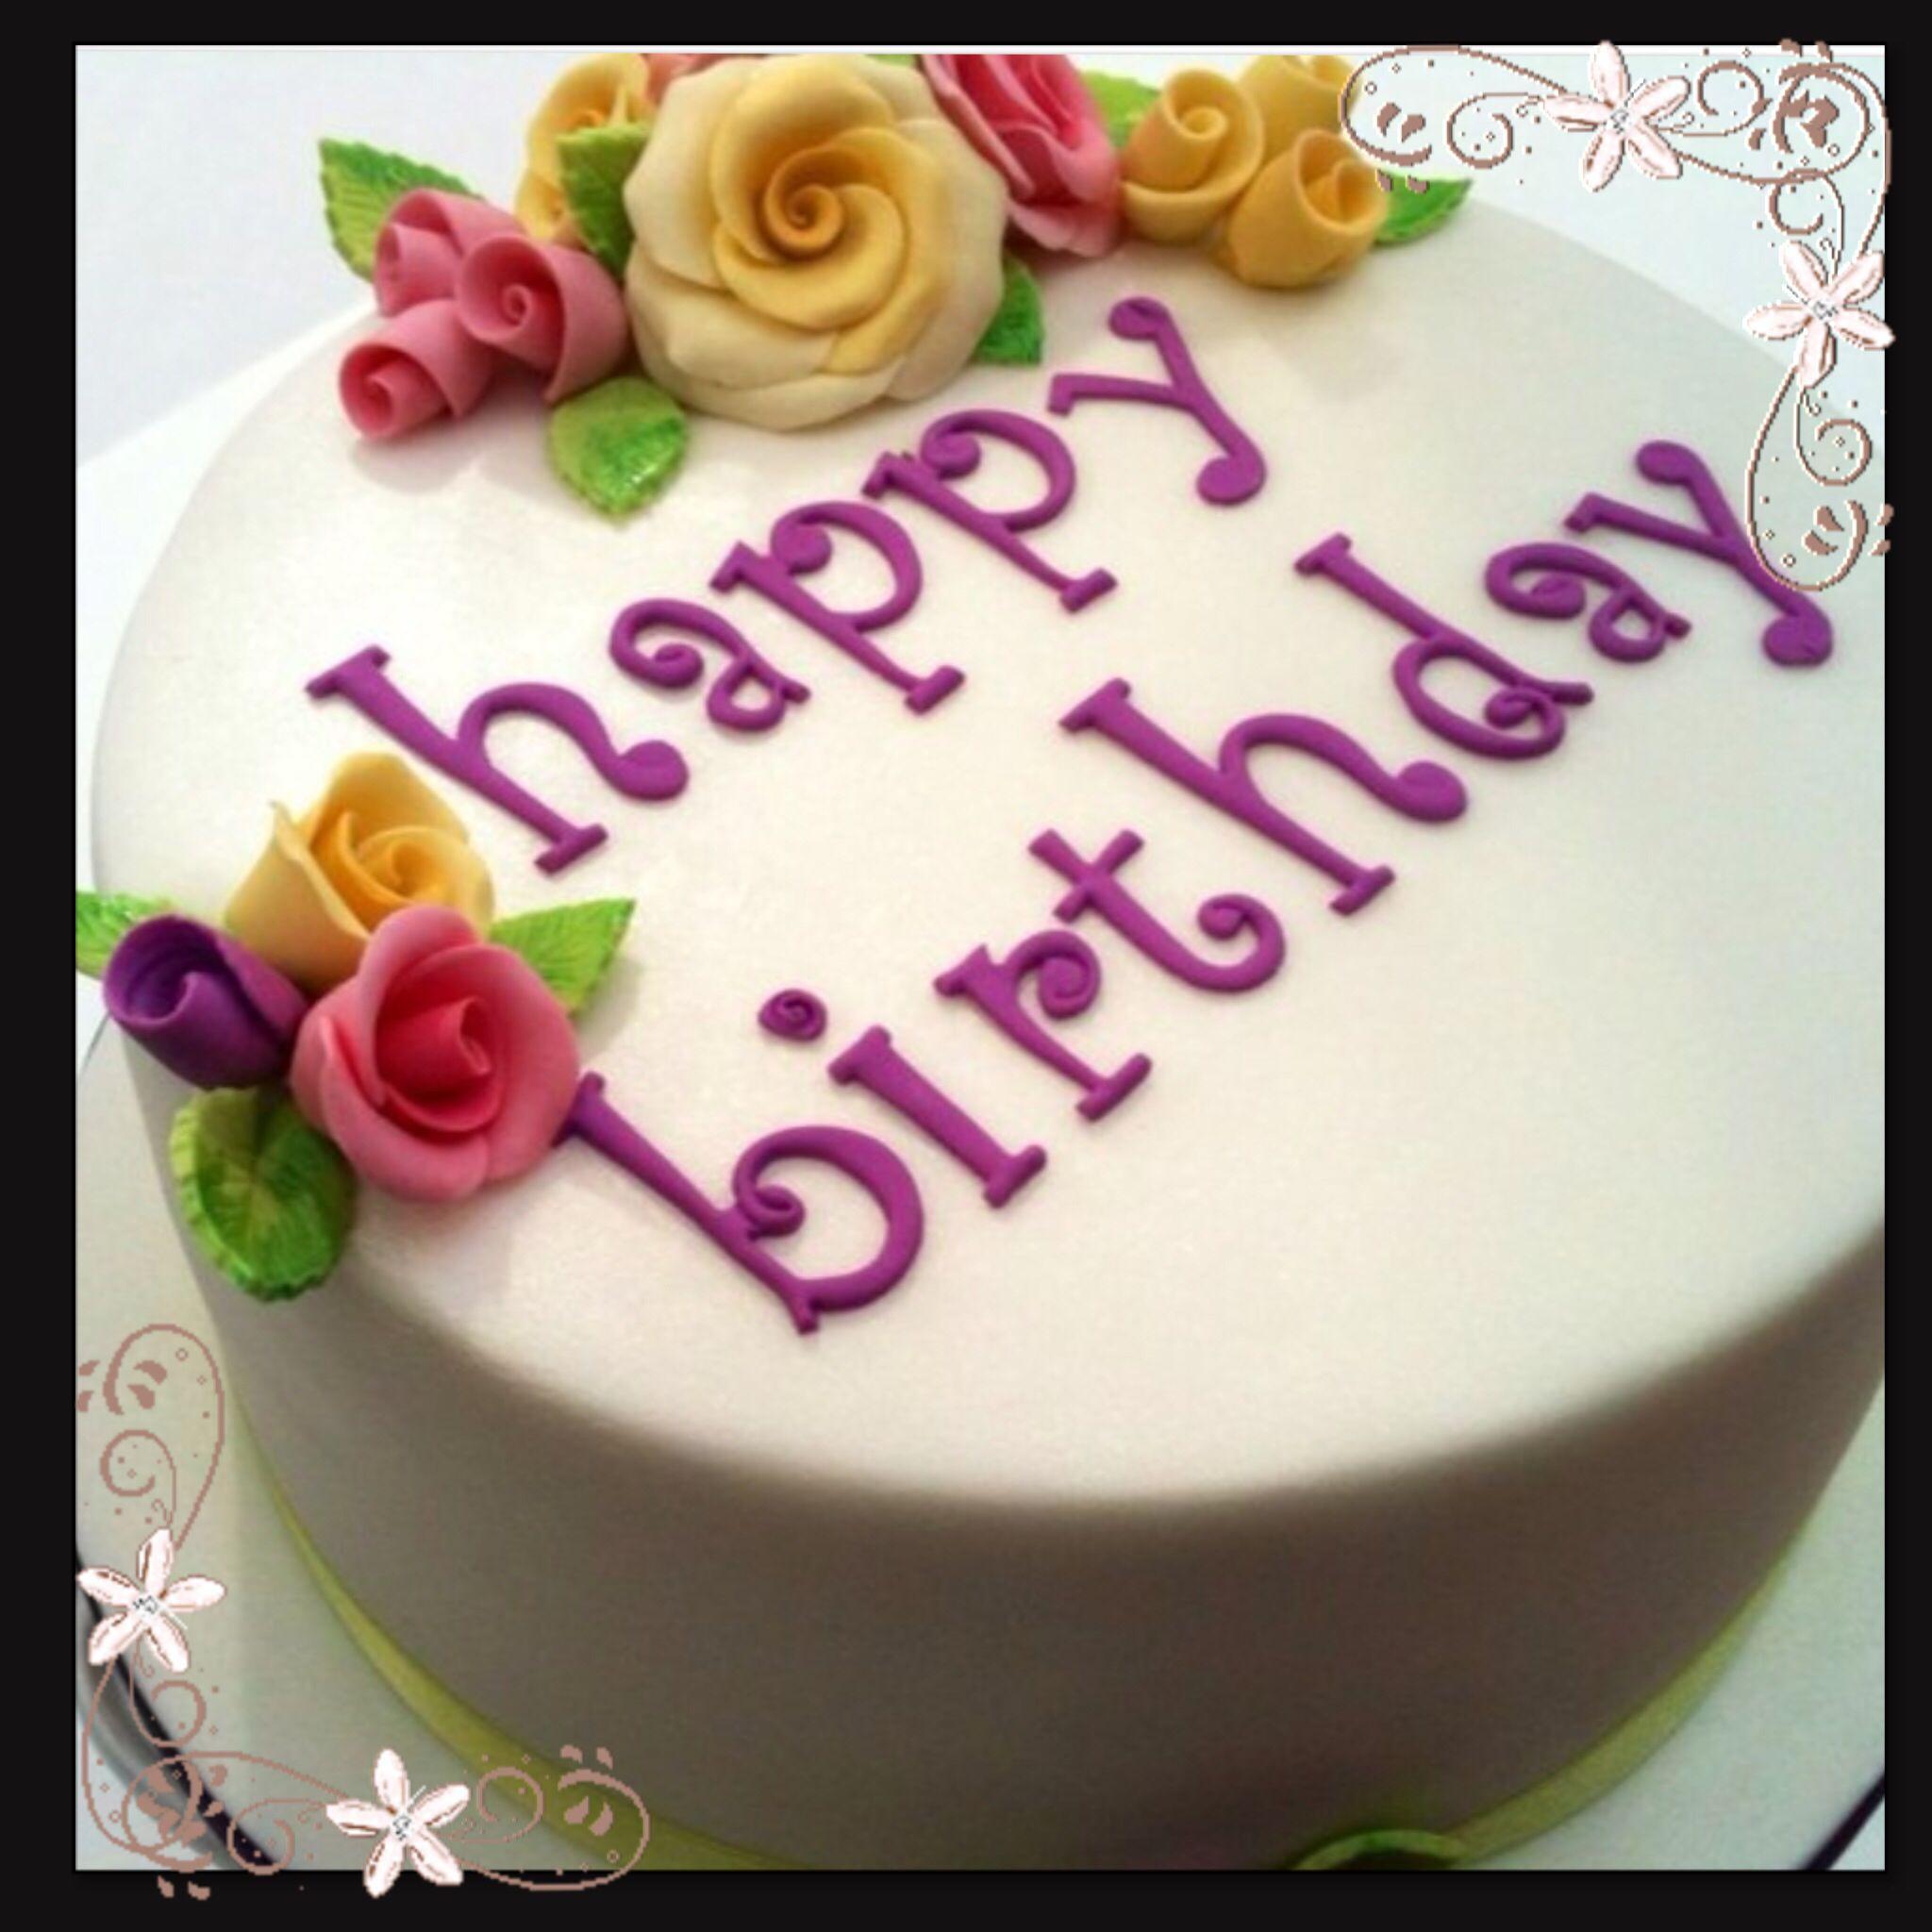 Pin By Patricia Lee On Birthday Greetings Pinterest Birthday